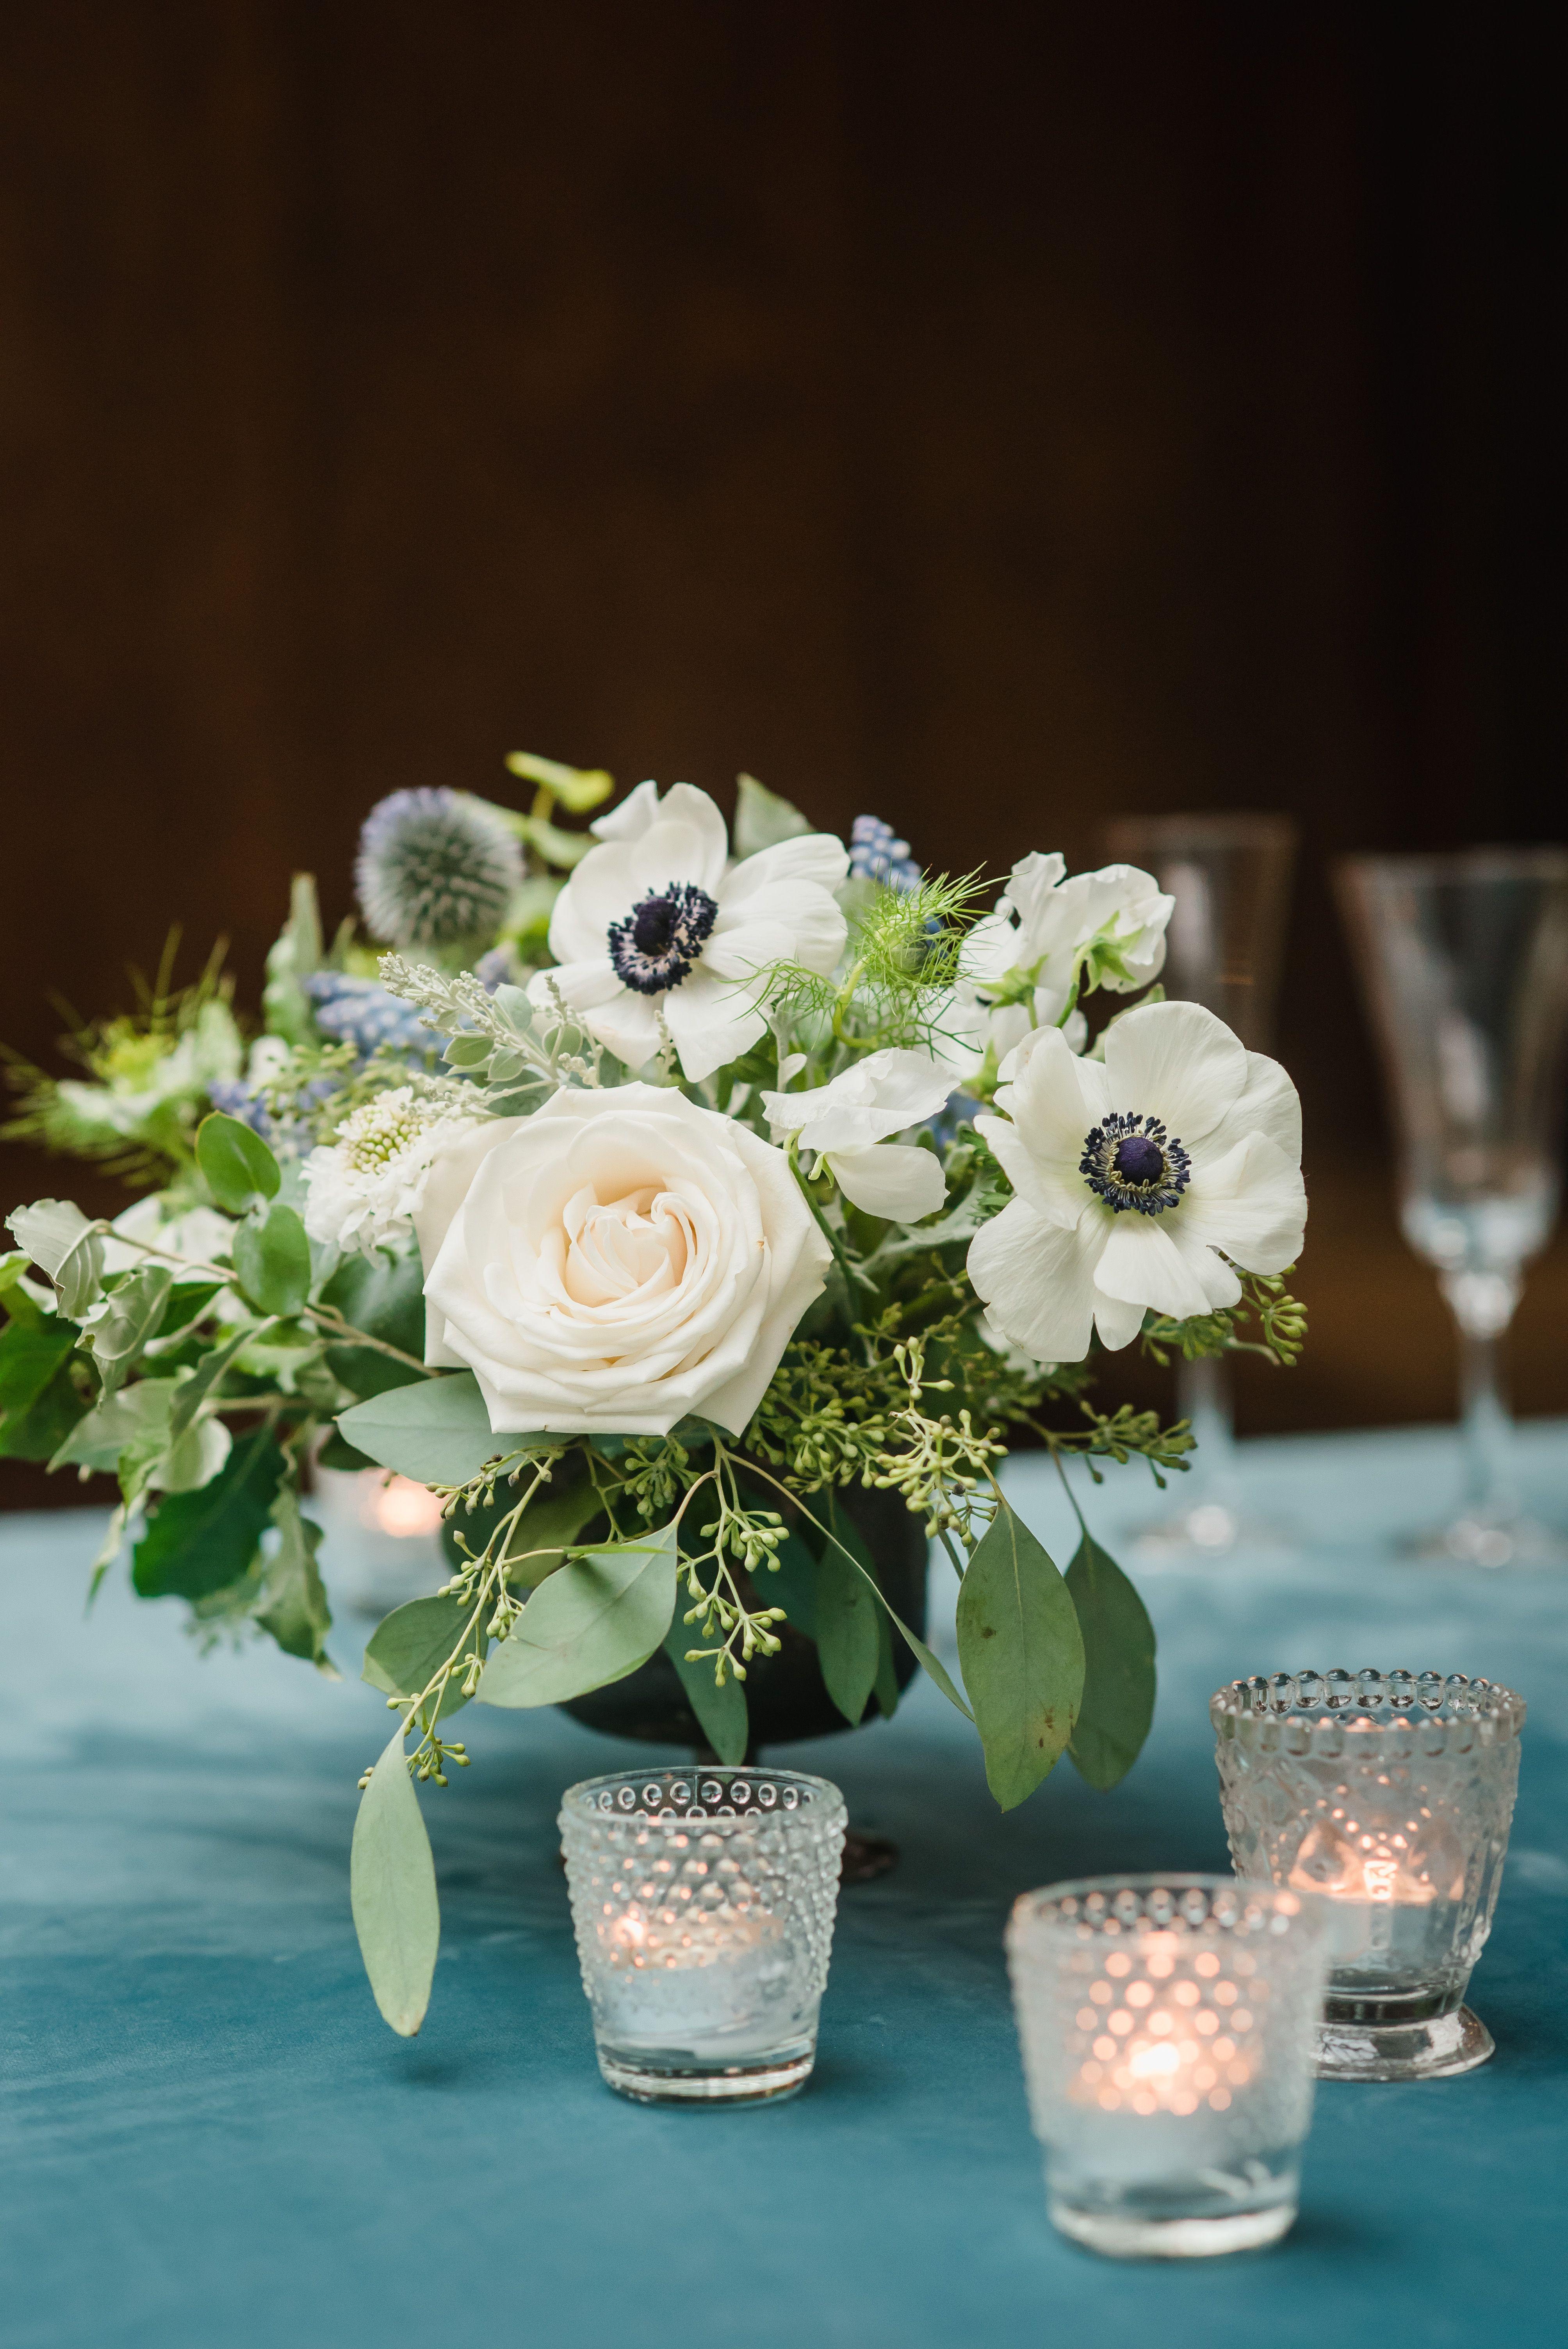 Event Venue North Of Boston Meetings Appreciation Events Team Building Flower Centerpieces Wedding White Flower Centerpieces White Floral Centerpieces